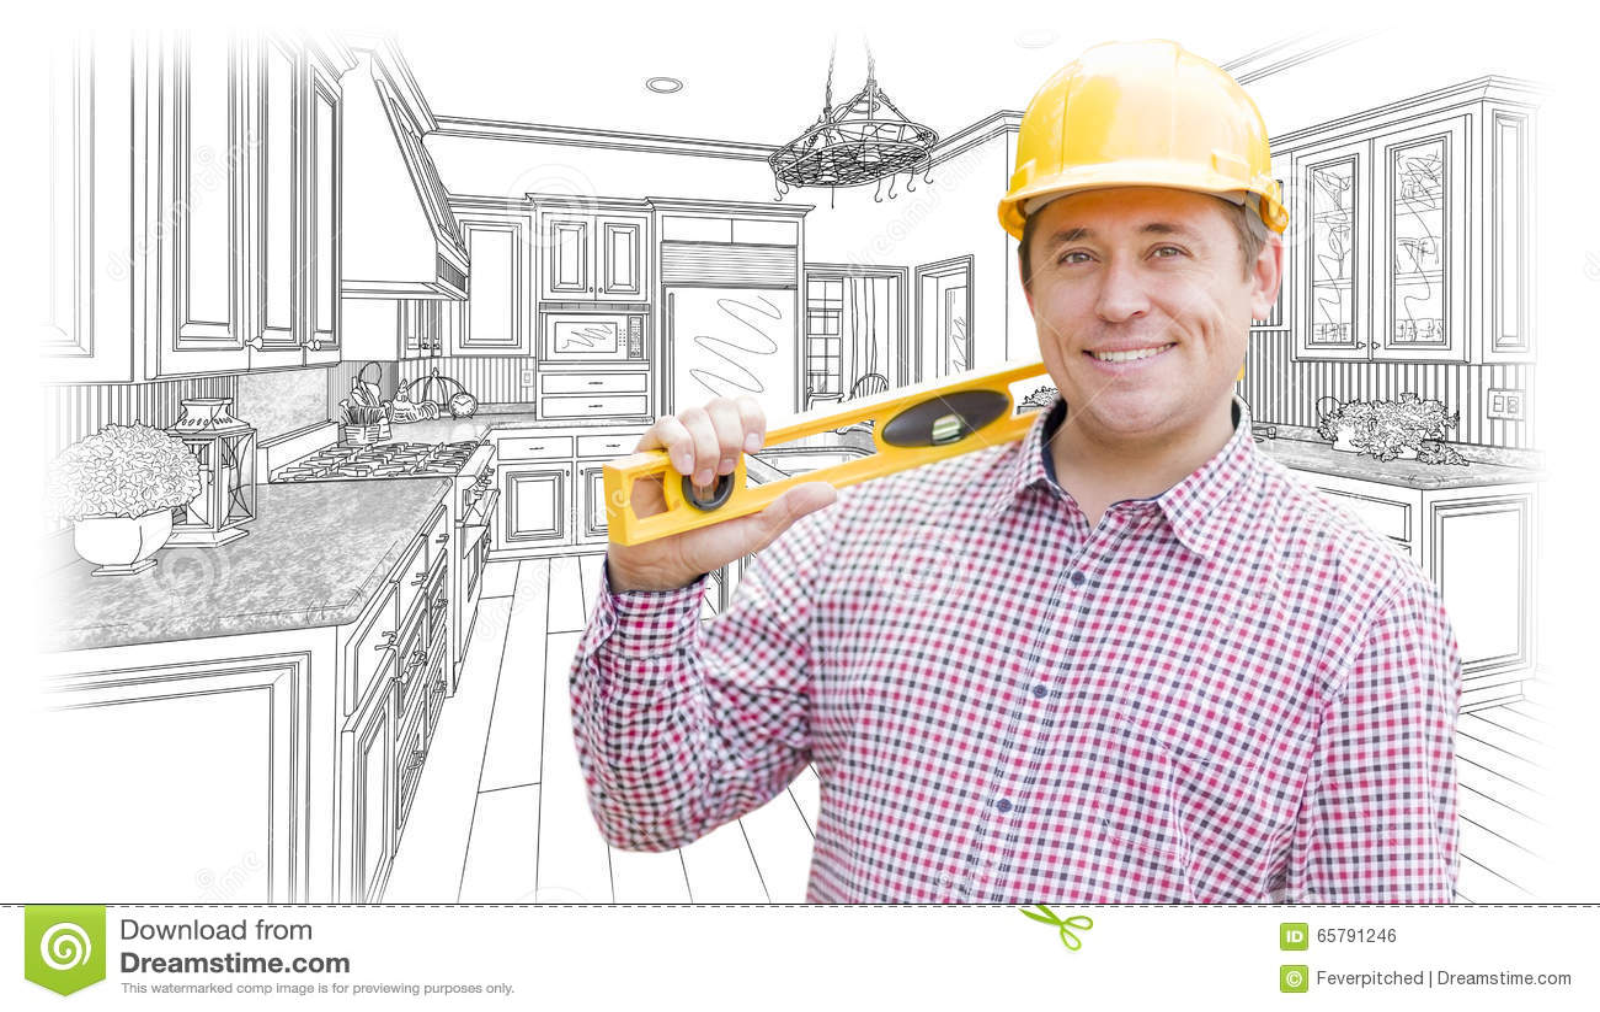 kitchen contractor vegas hotels with 在安全帽的承包商有在习惯厨房图画的水平的库存例证 插画包括有安全帽 在安全帽的承包商有在习惯厨房图画的水平的